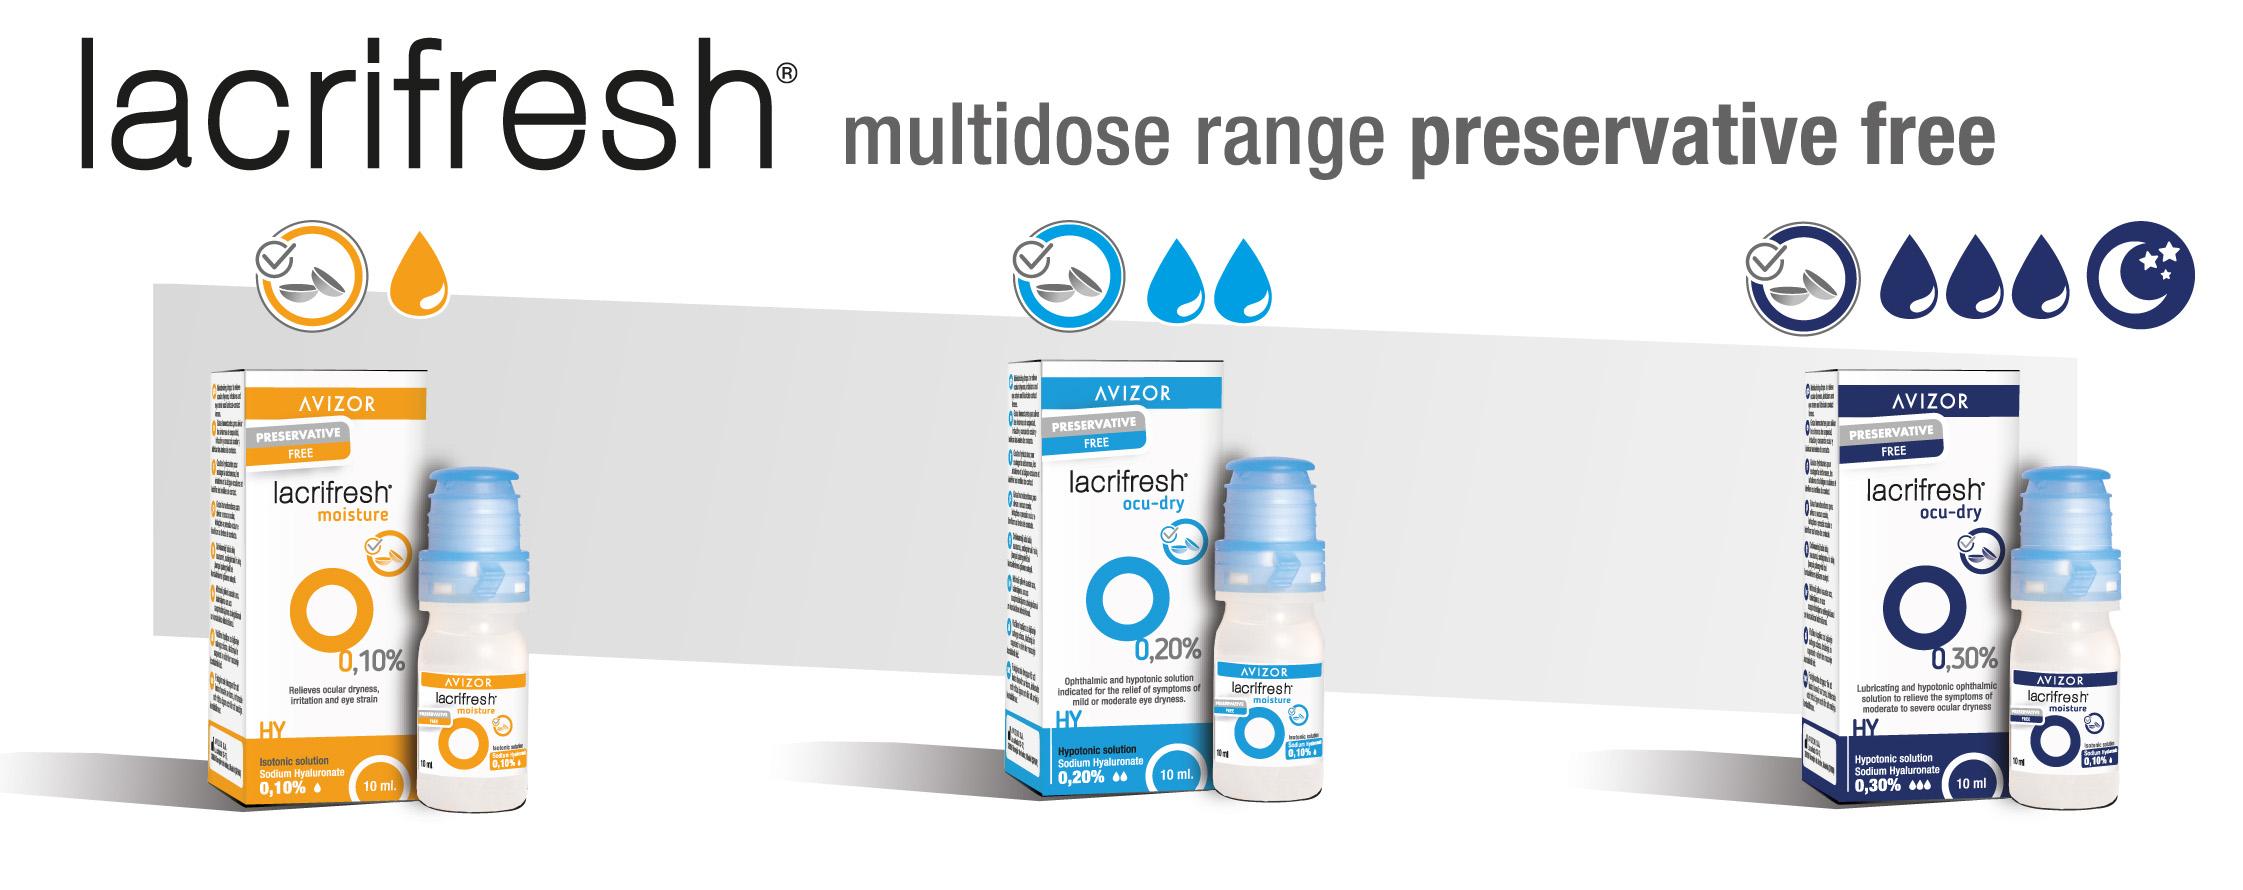 Avizor - lacrifresh multidose range